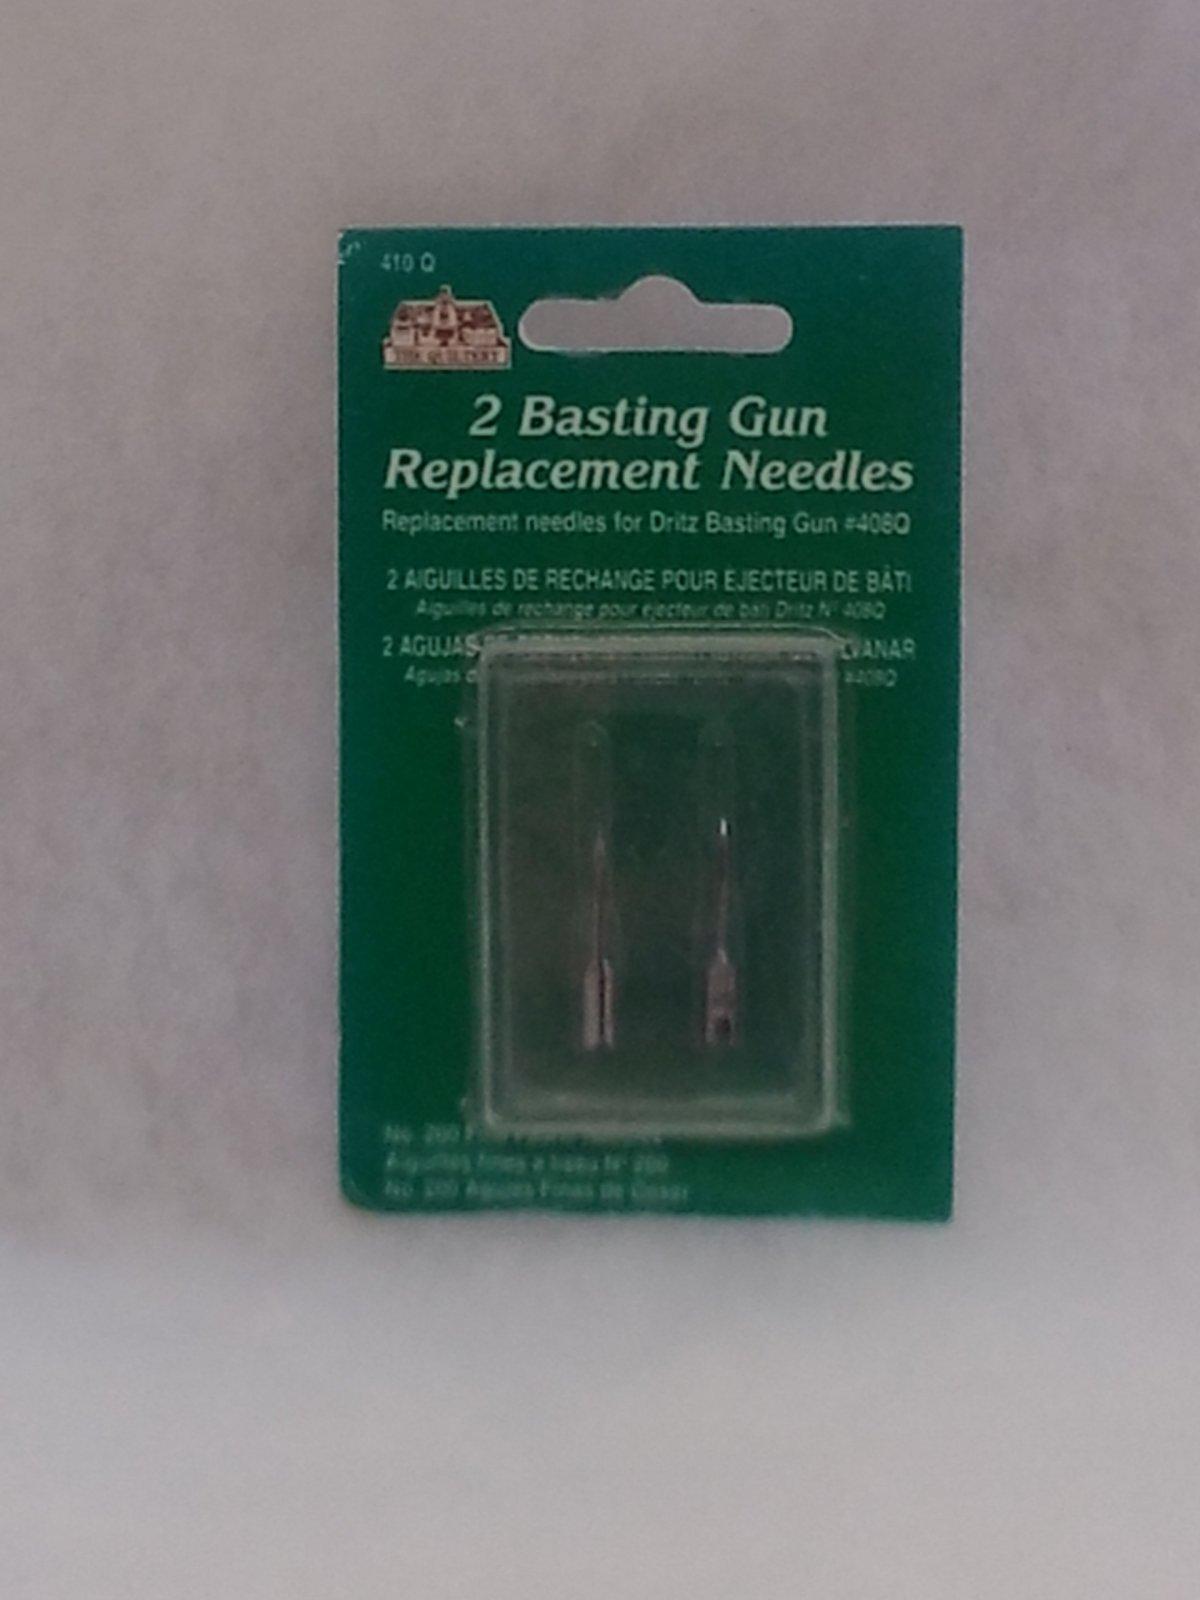 Replacement Needles Dritz Basting Gun #408Q